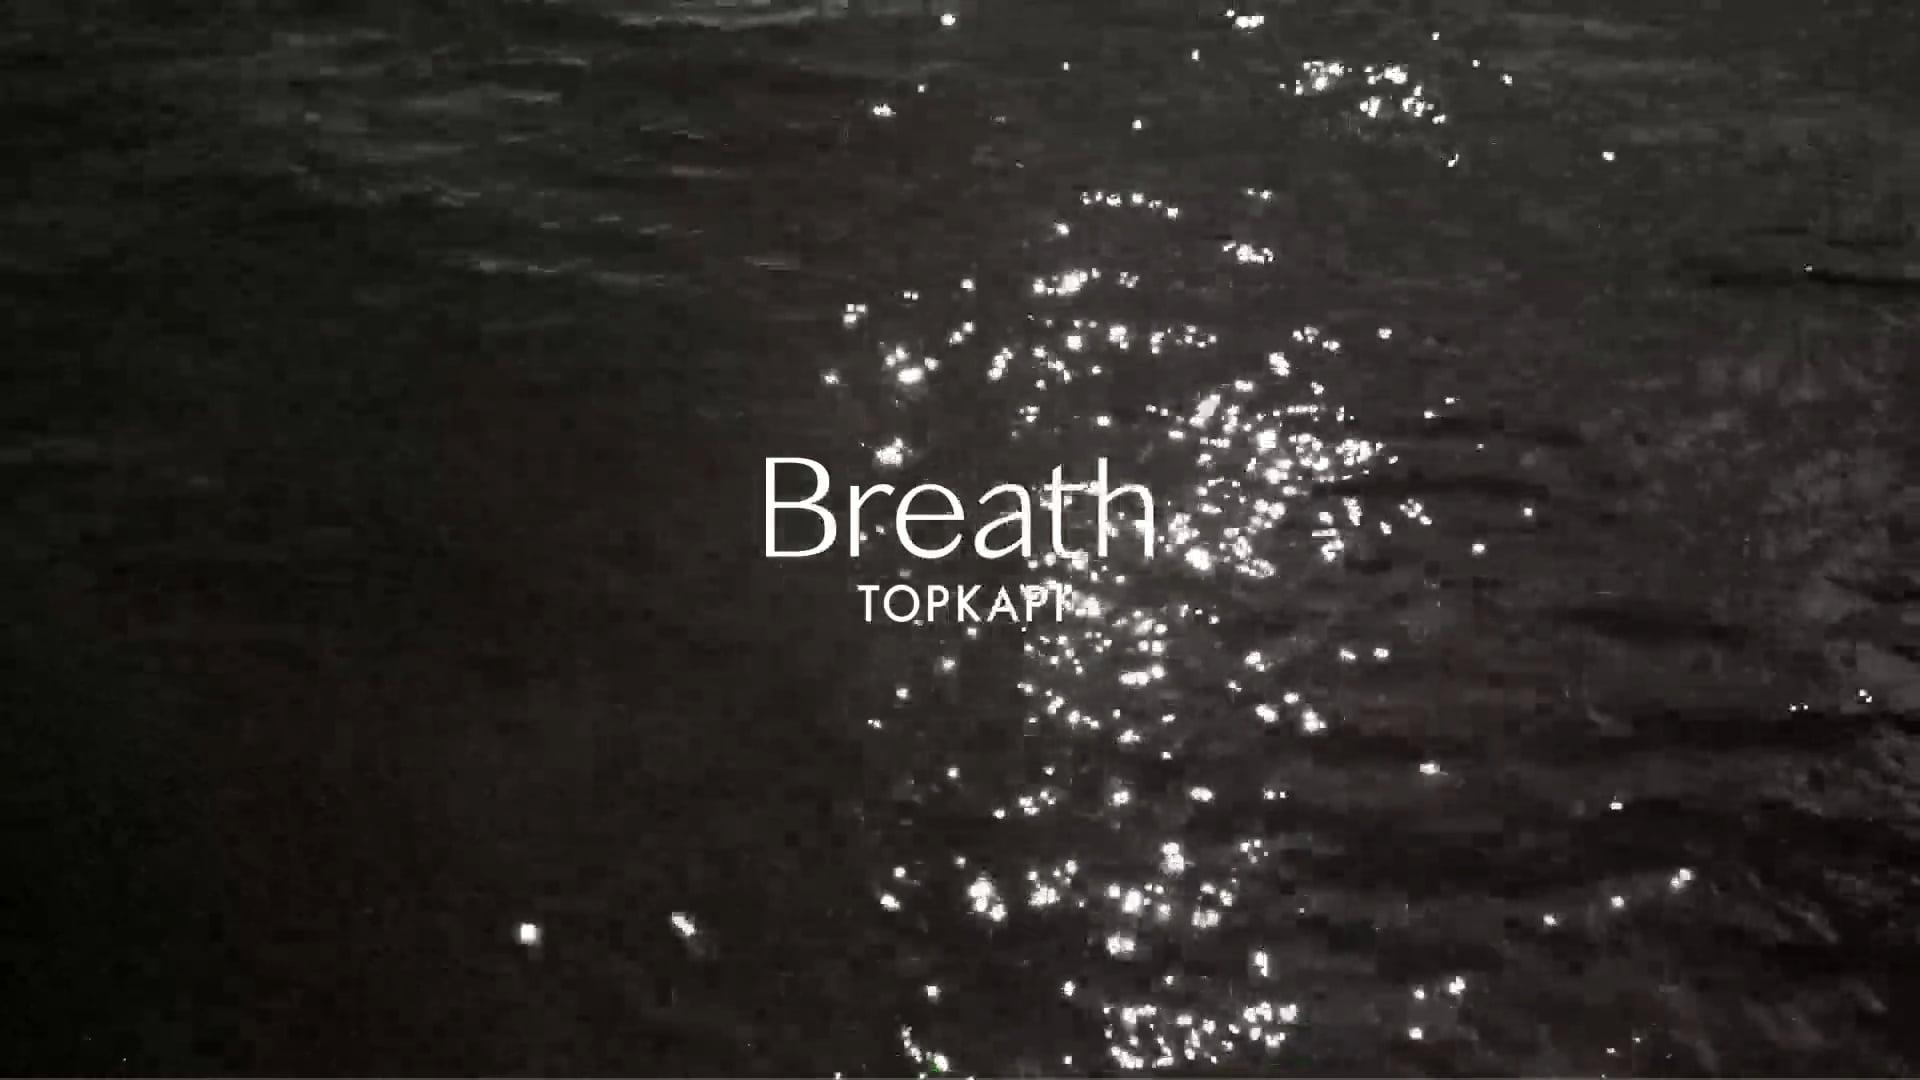 Breath -TOPKAPI-